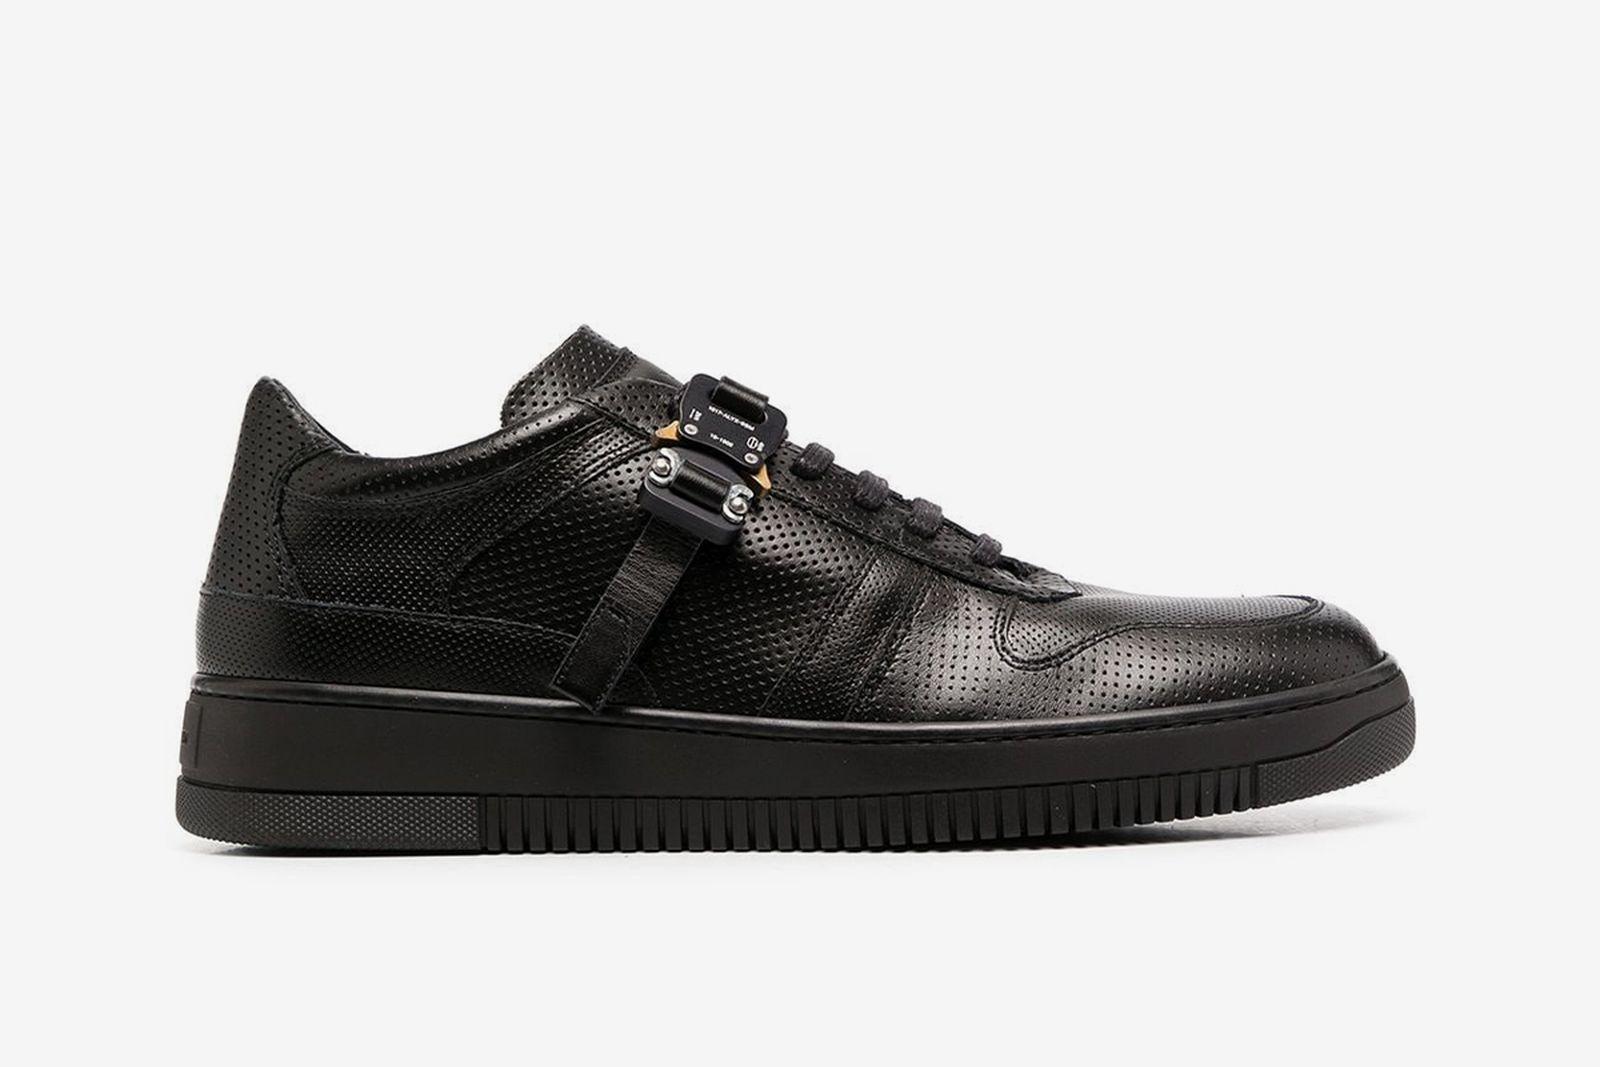 Shop Our Favorite Black Friday Sneaker Deals Here